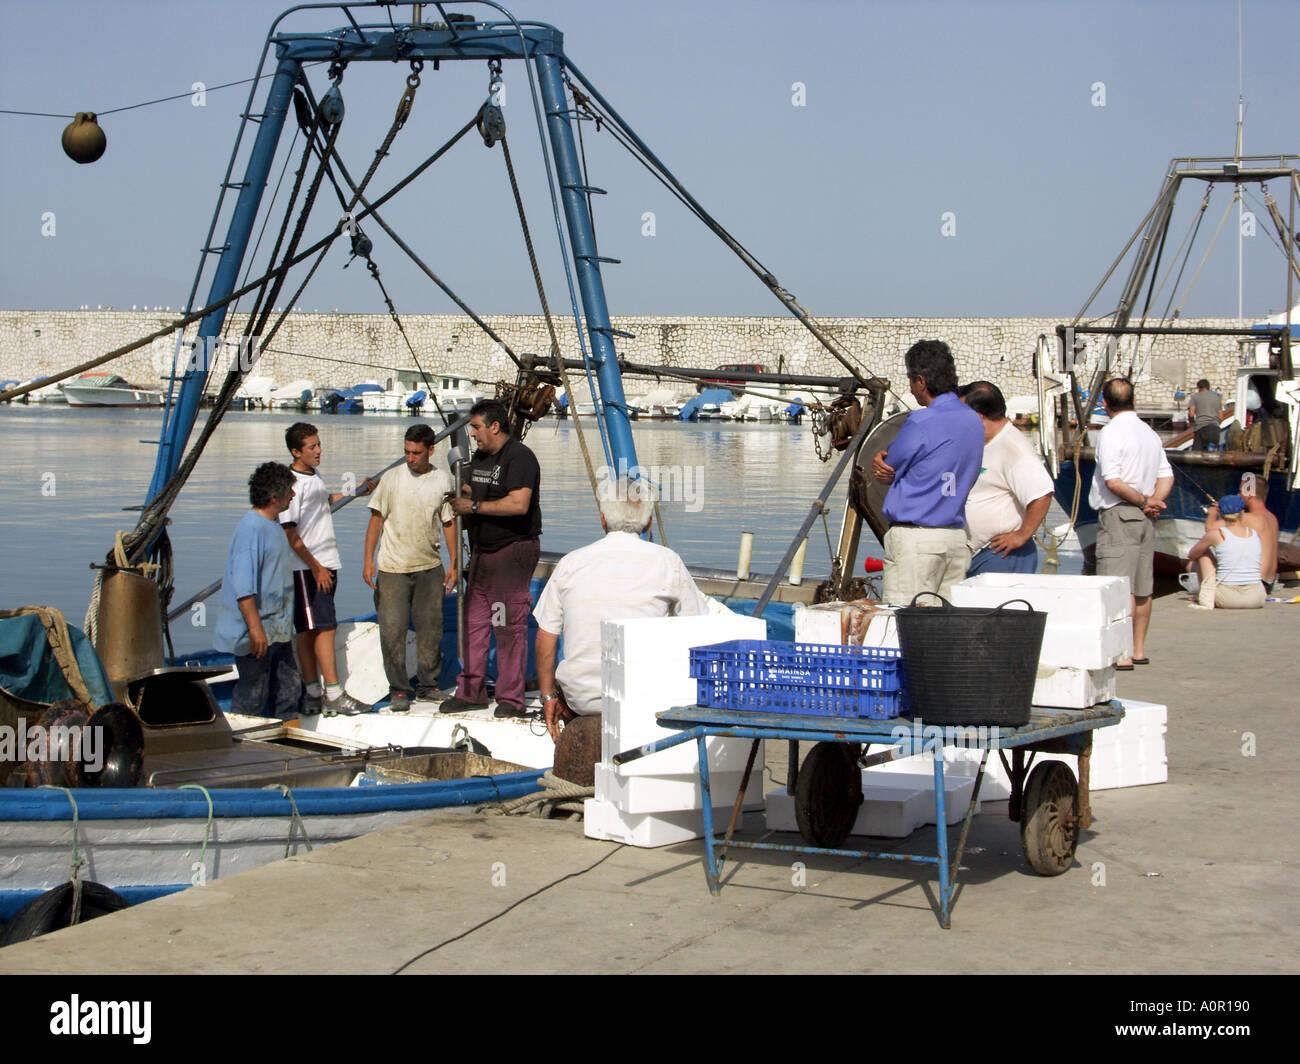 Sorting and Boxing the Catch, Puerto Deportivo de Fuengirola, Fuengirola Port, Costa del Sol, Spain - Stock Image